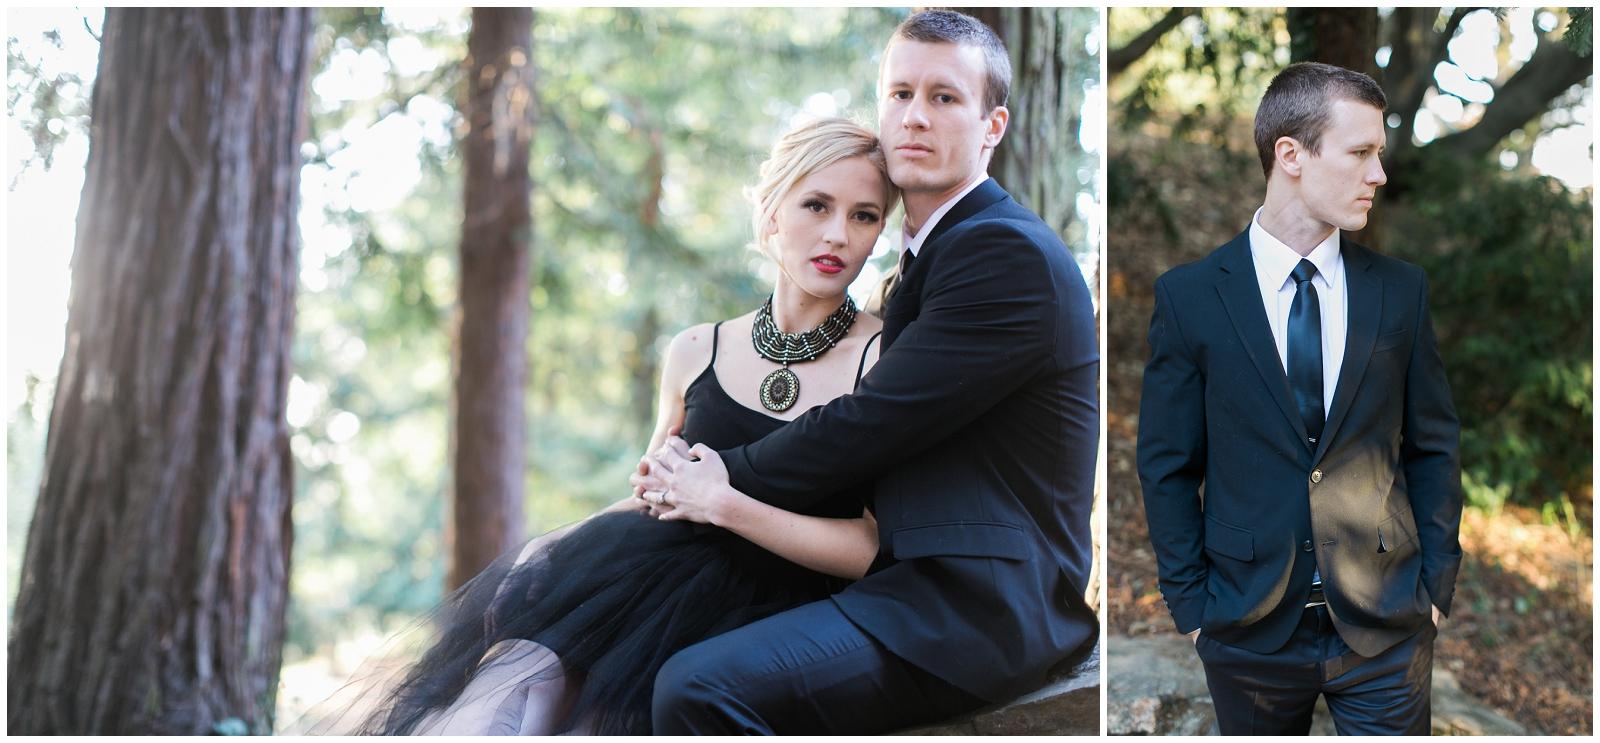 San-Francisco-Bay-Area-Wedding-Photography-Engagement-Redwoods-15.jpg